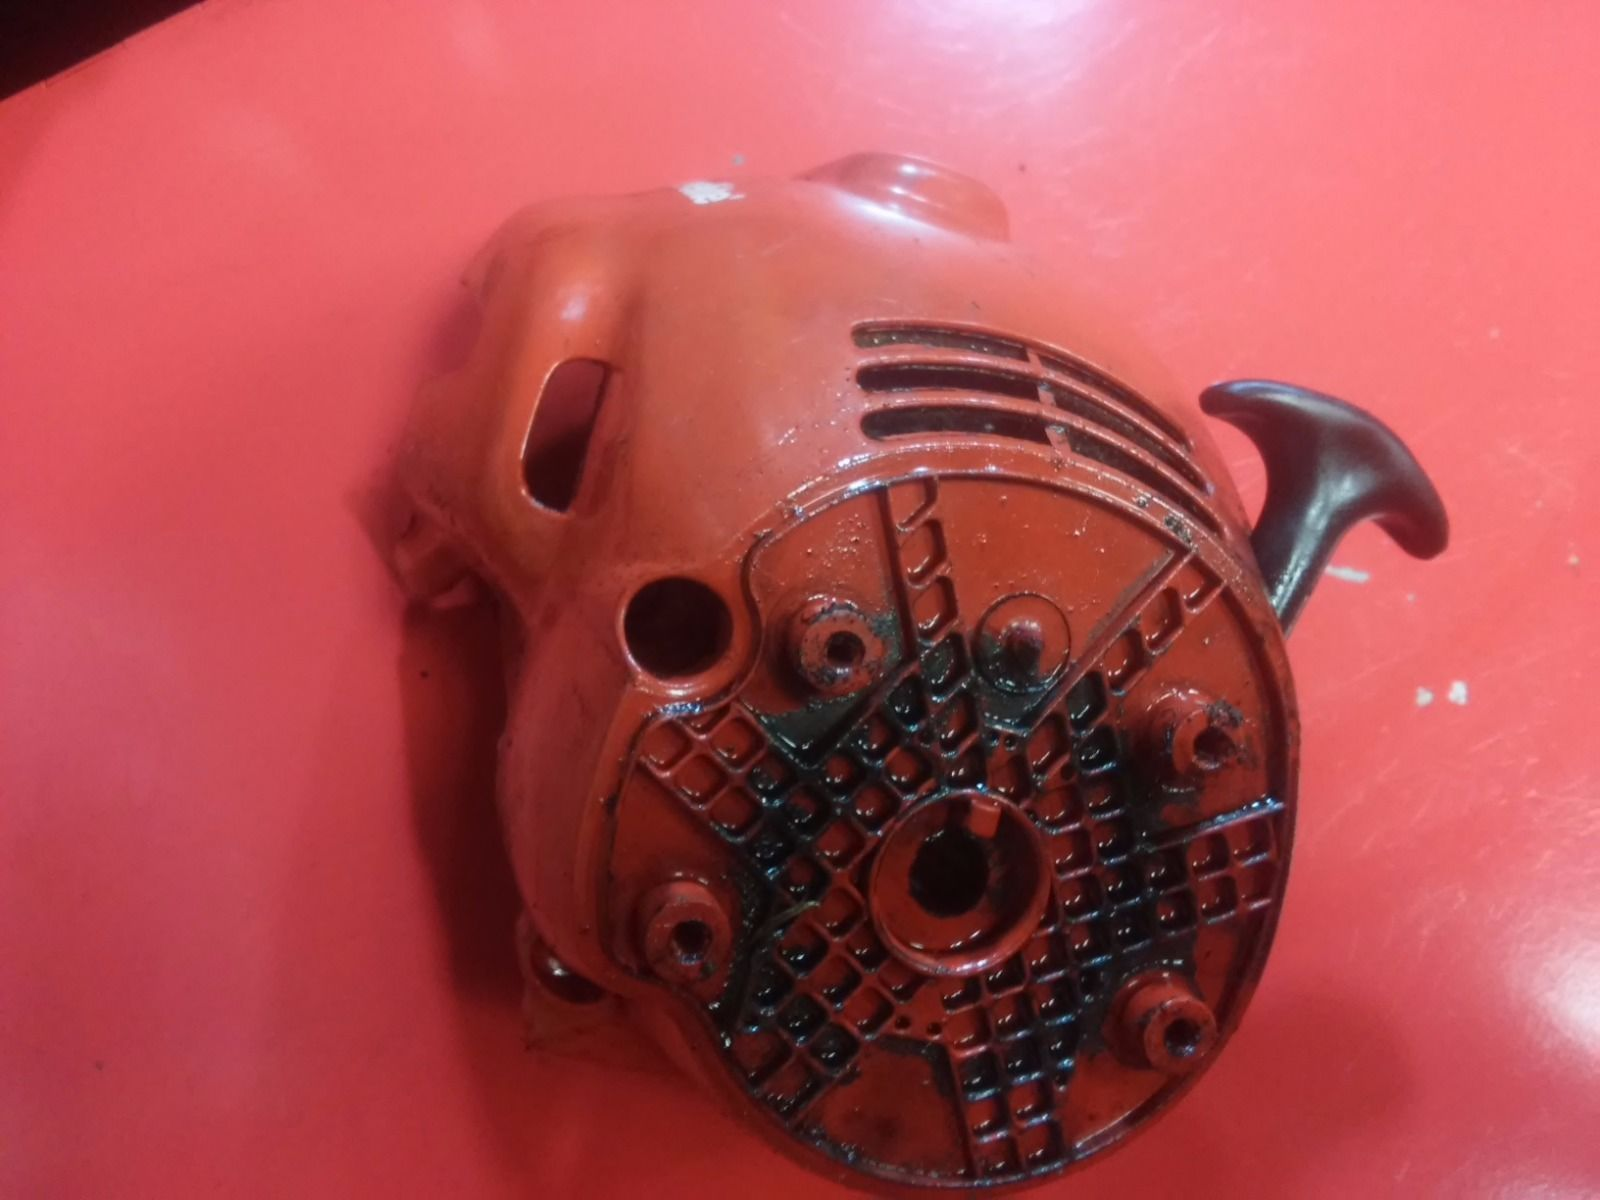 Homelite Z830sb trimmer rewind starter A07143